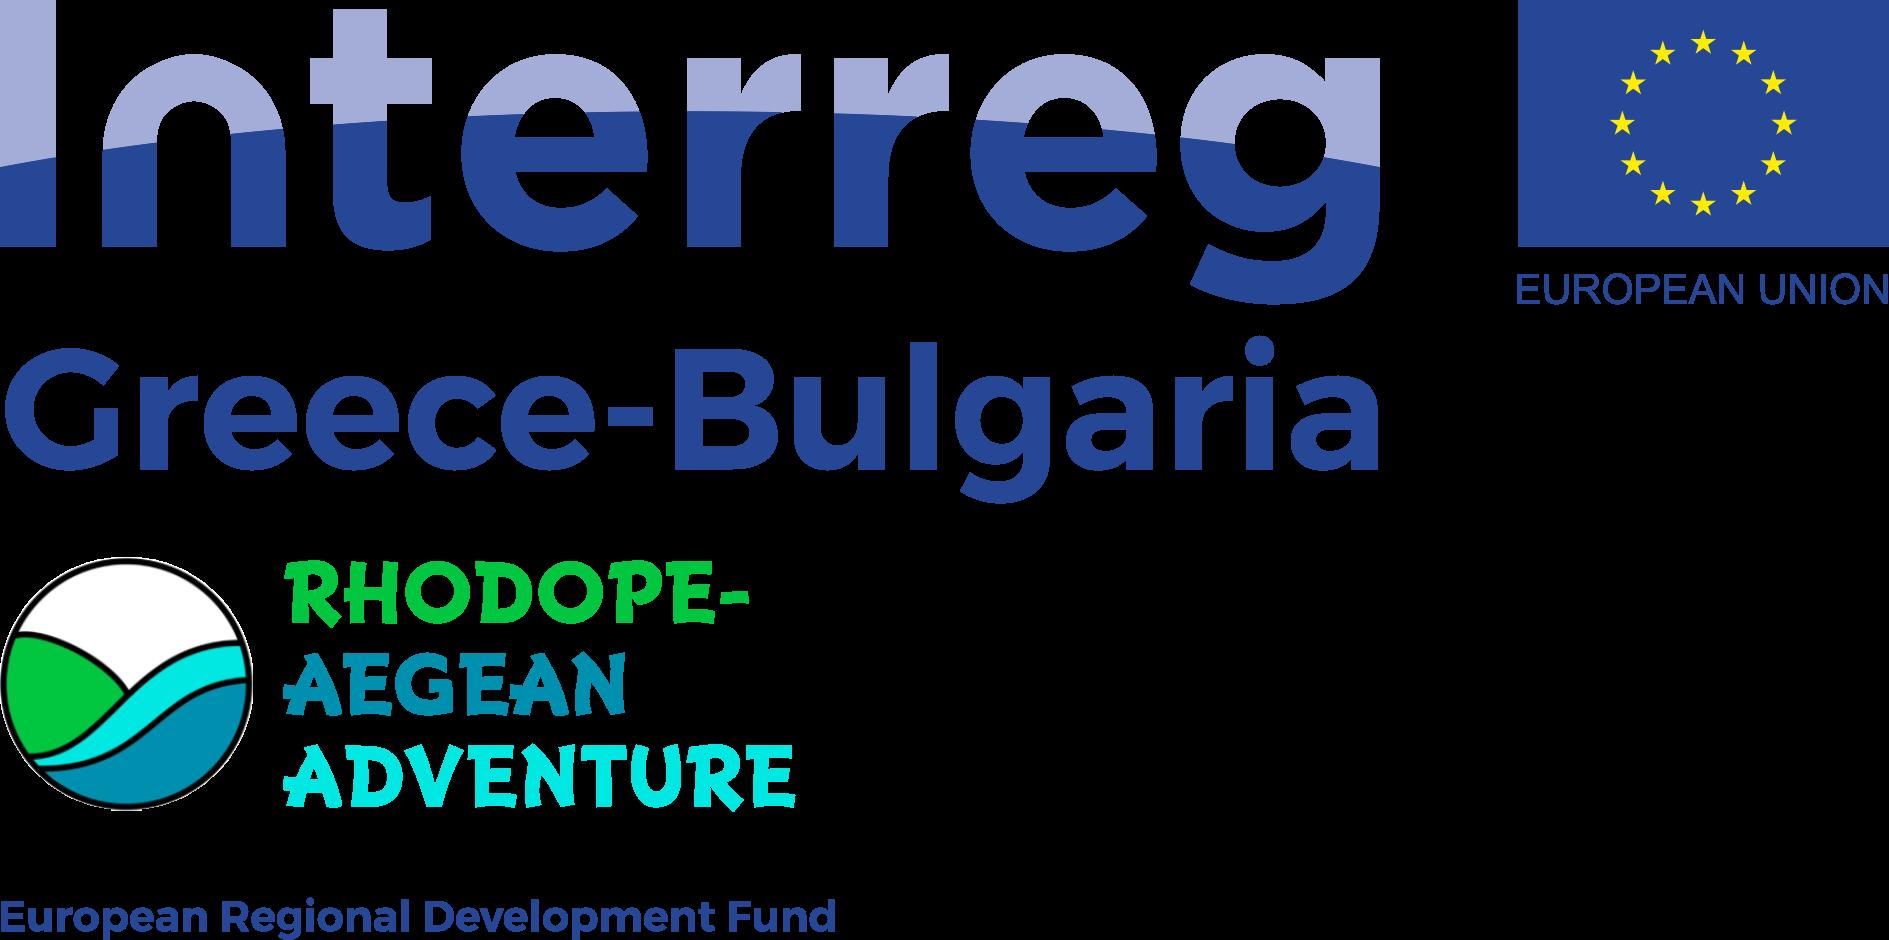 Interreg Rhodope Aegean Adventure